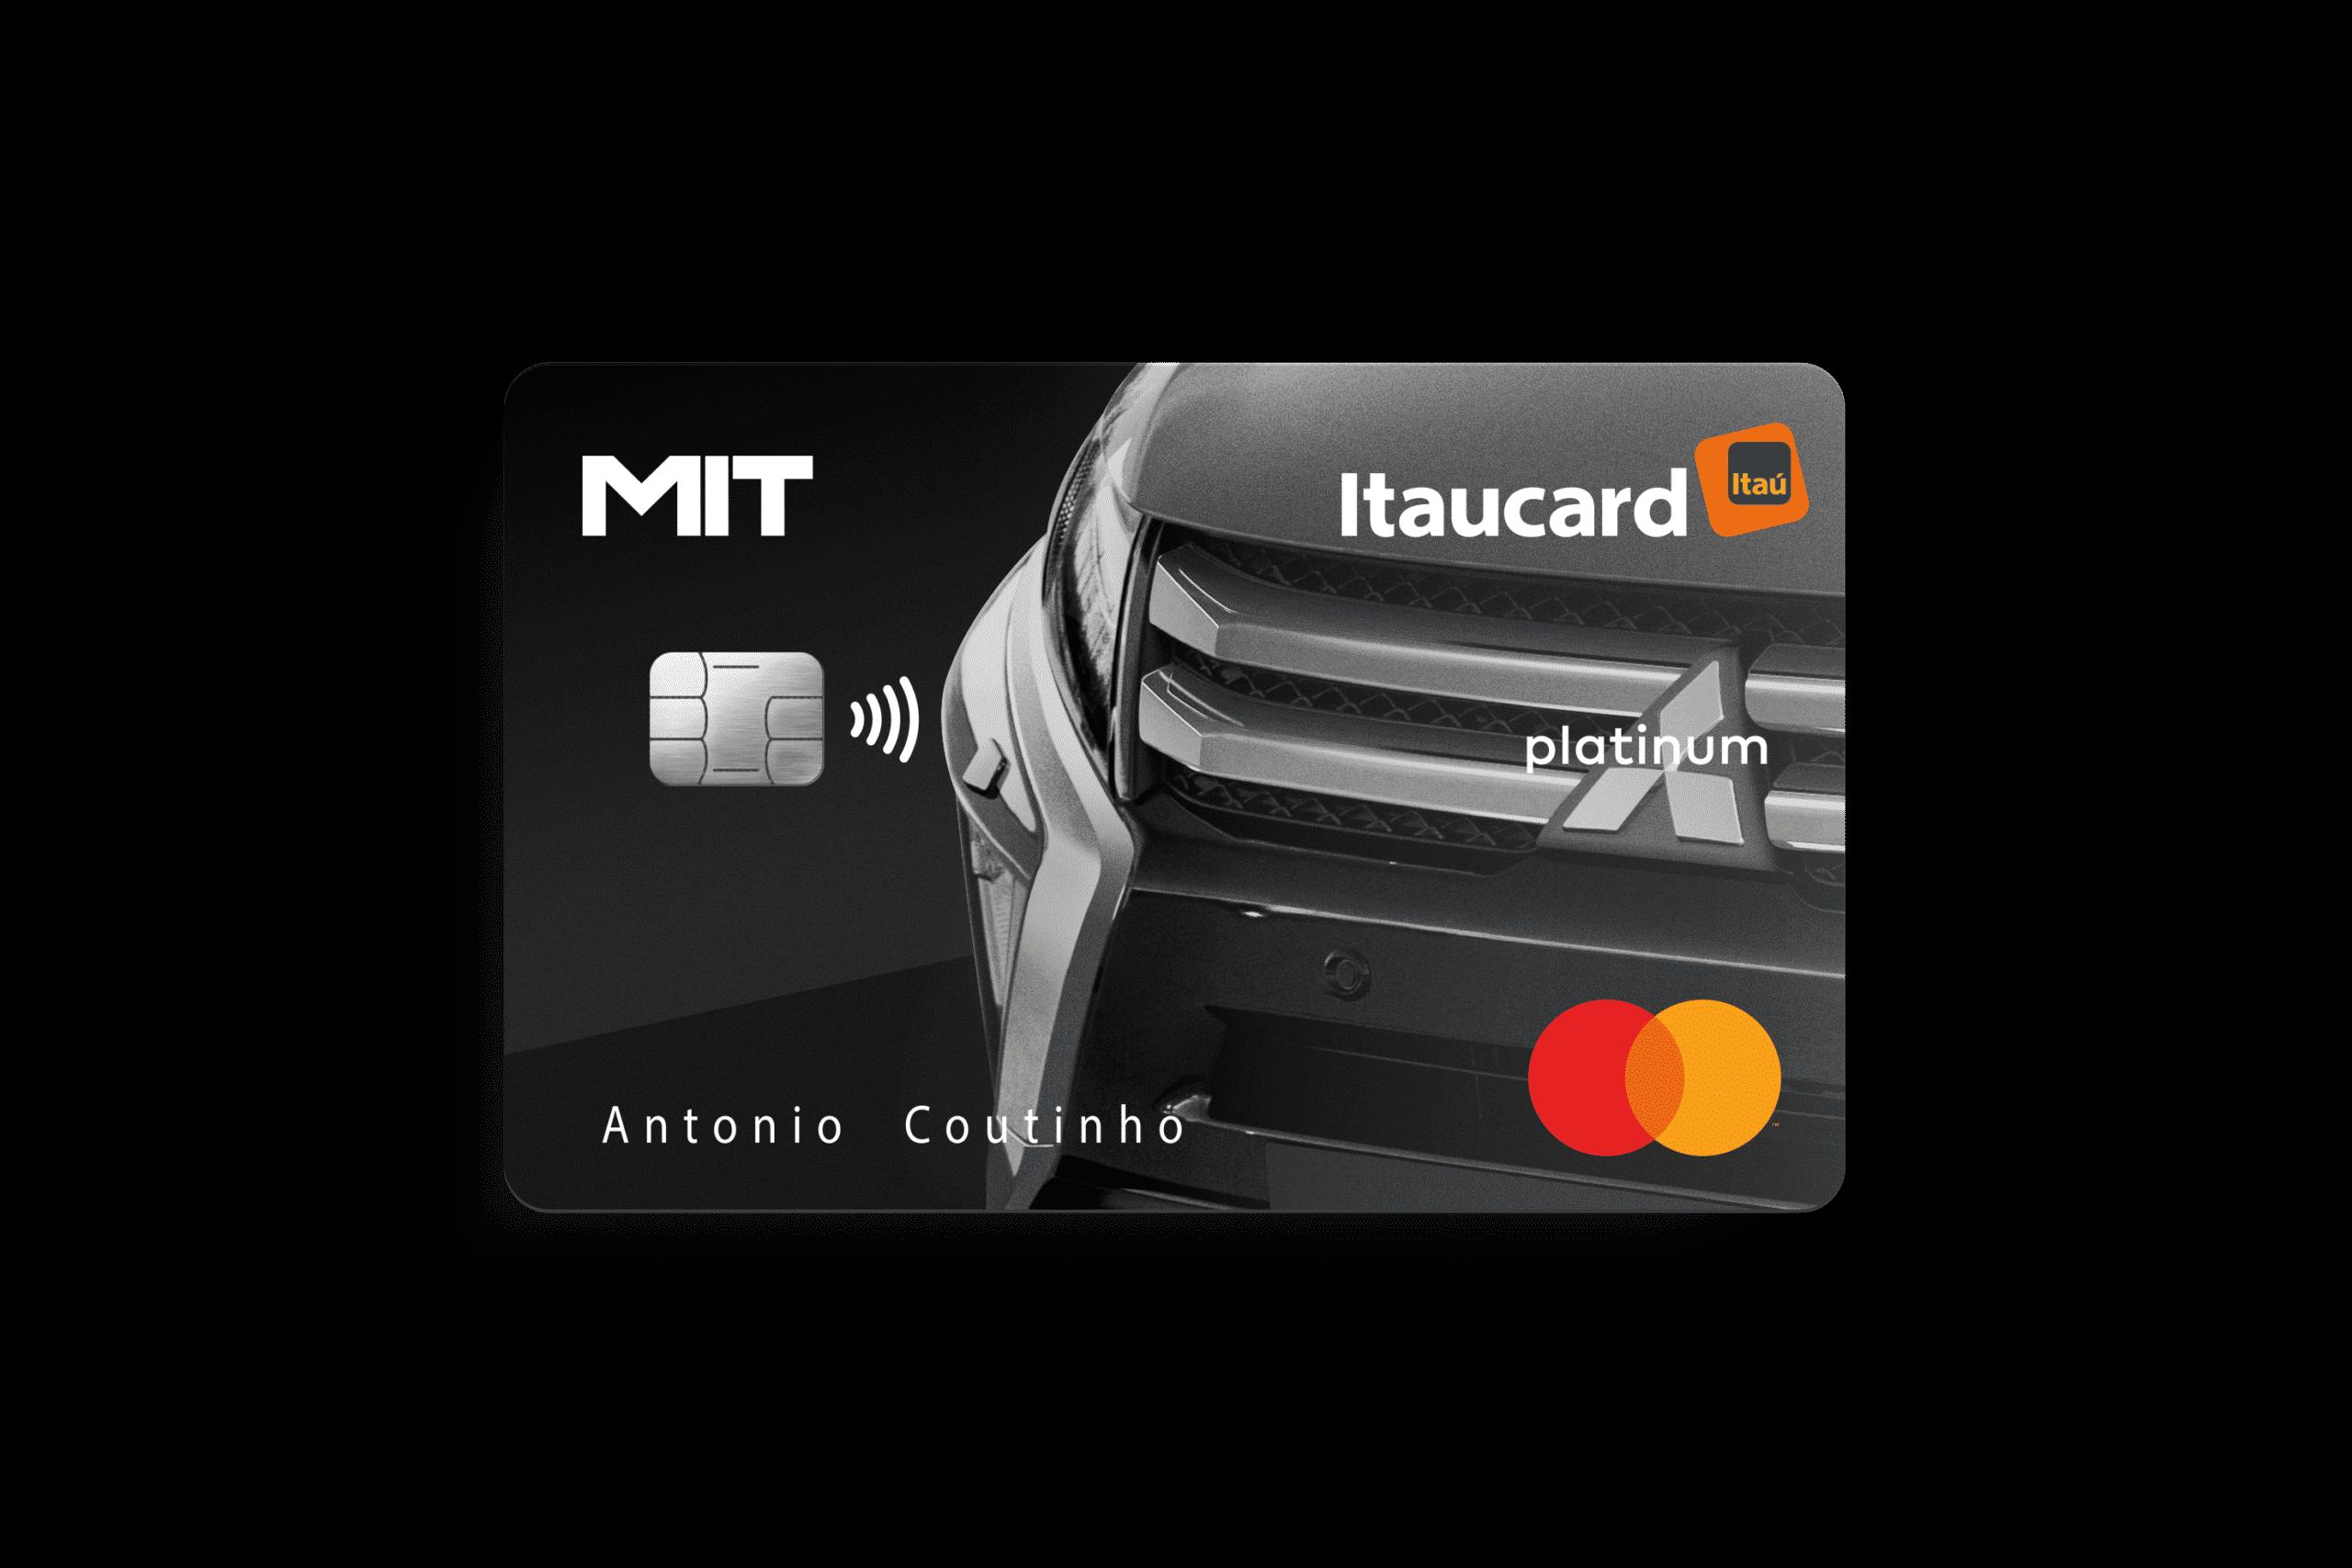 Cartao_MIT_Itaucard